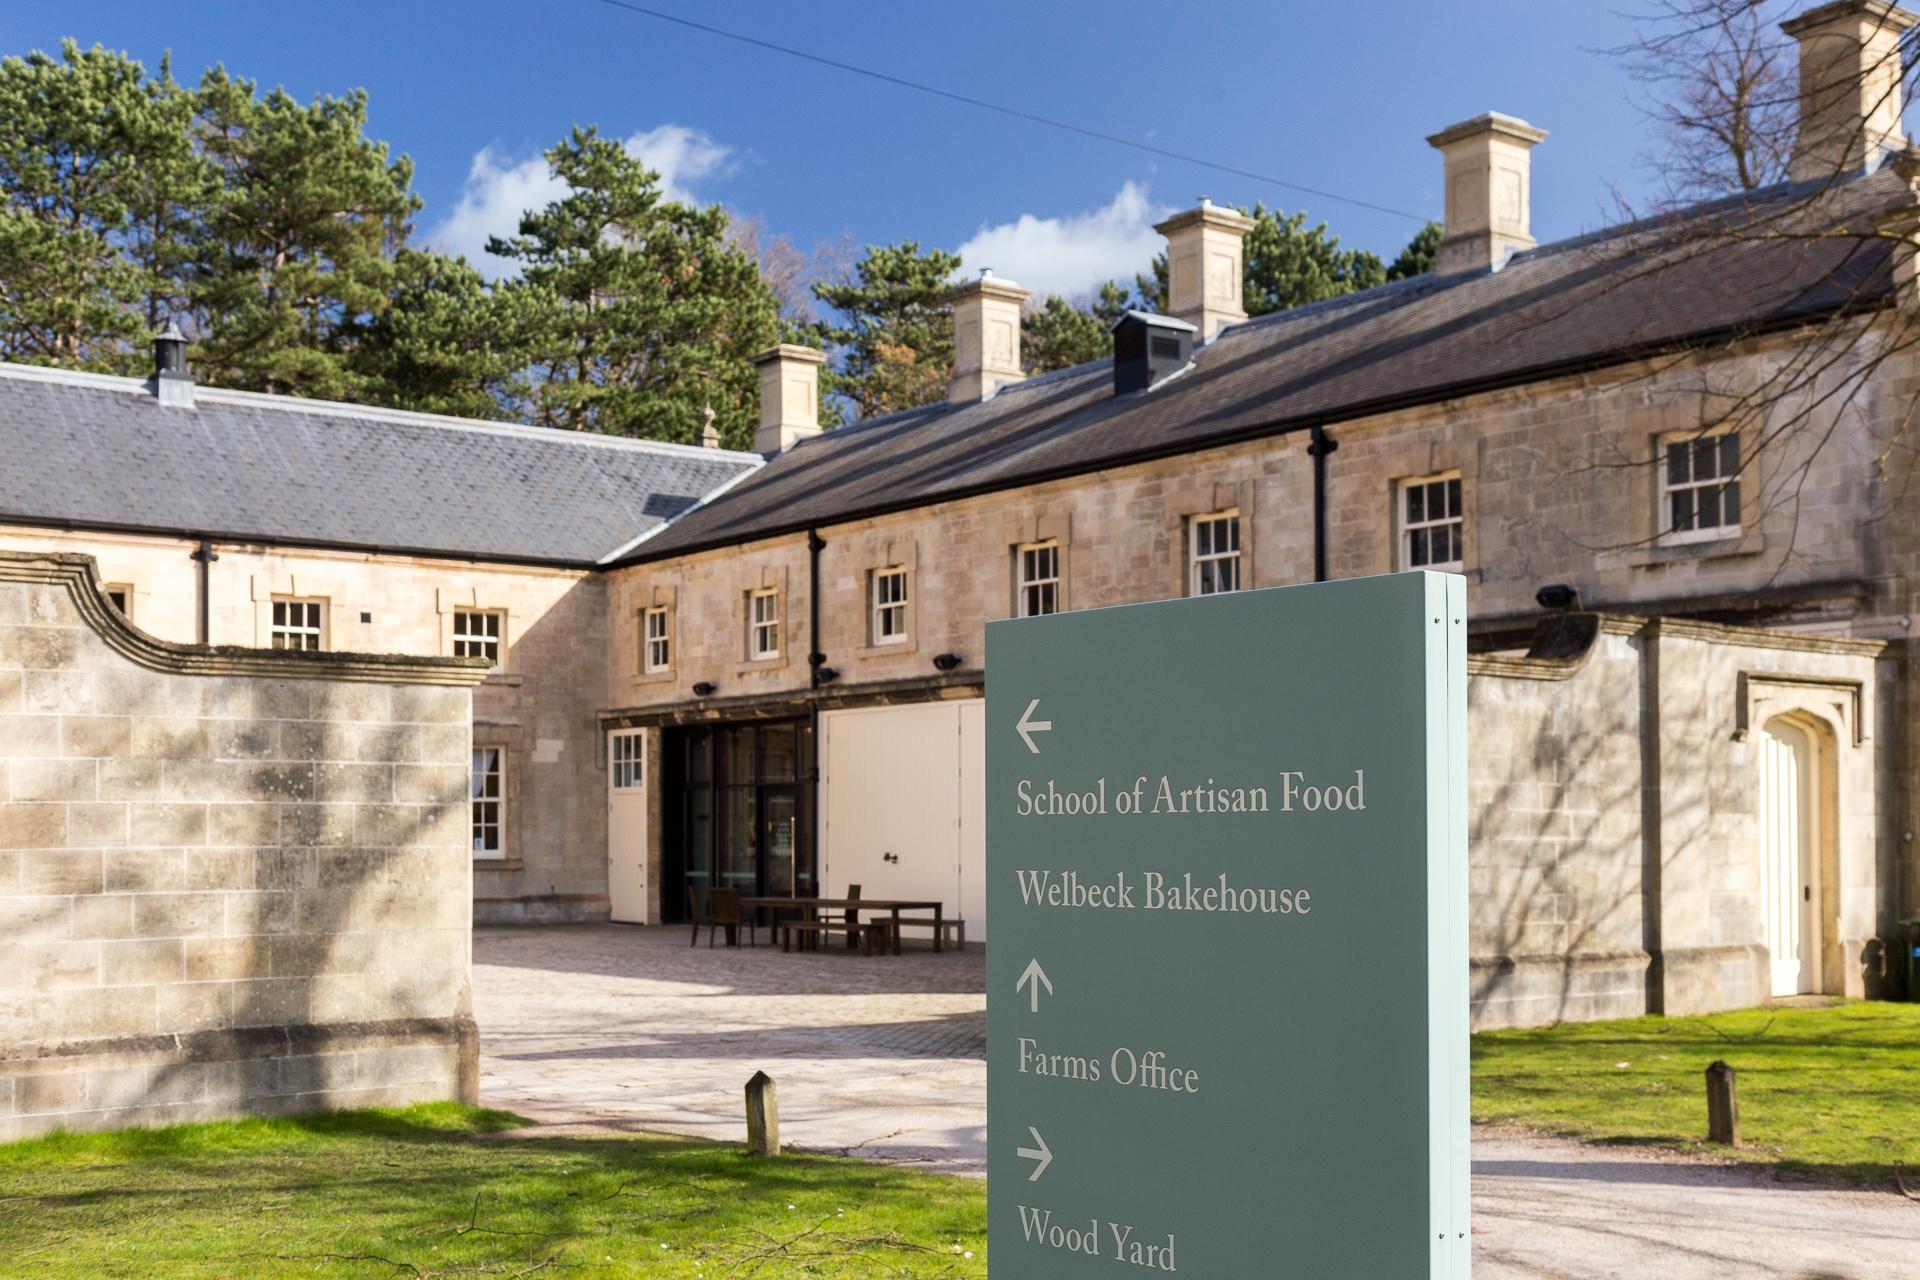 THE SCHOOL OF ARTISAN FOOD MAKES RURAL OSCAR SHORTLIST